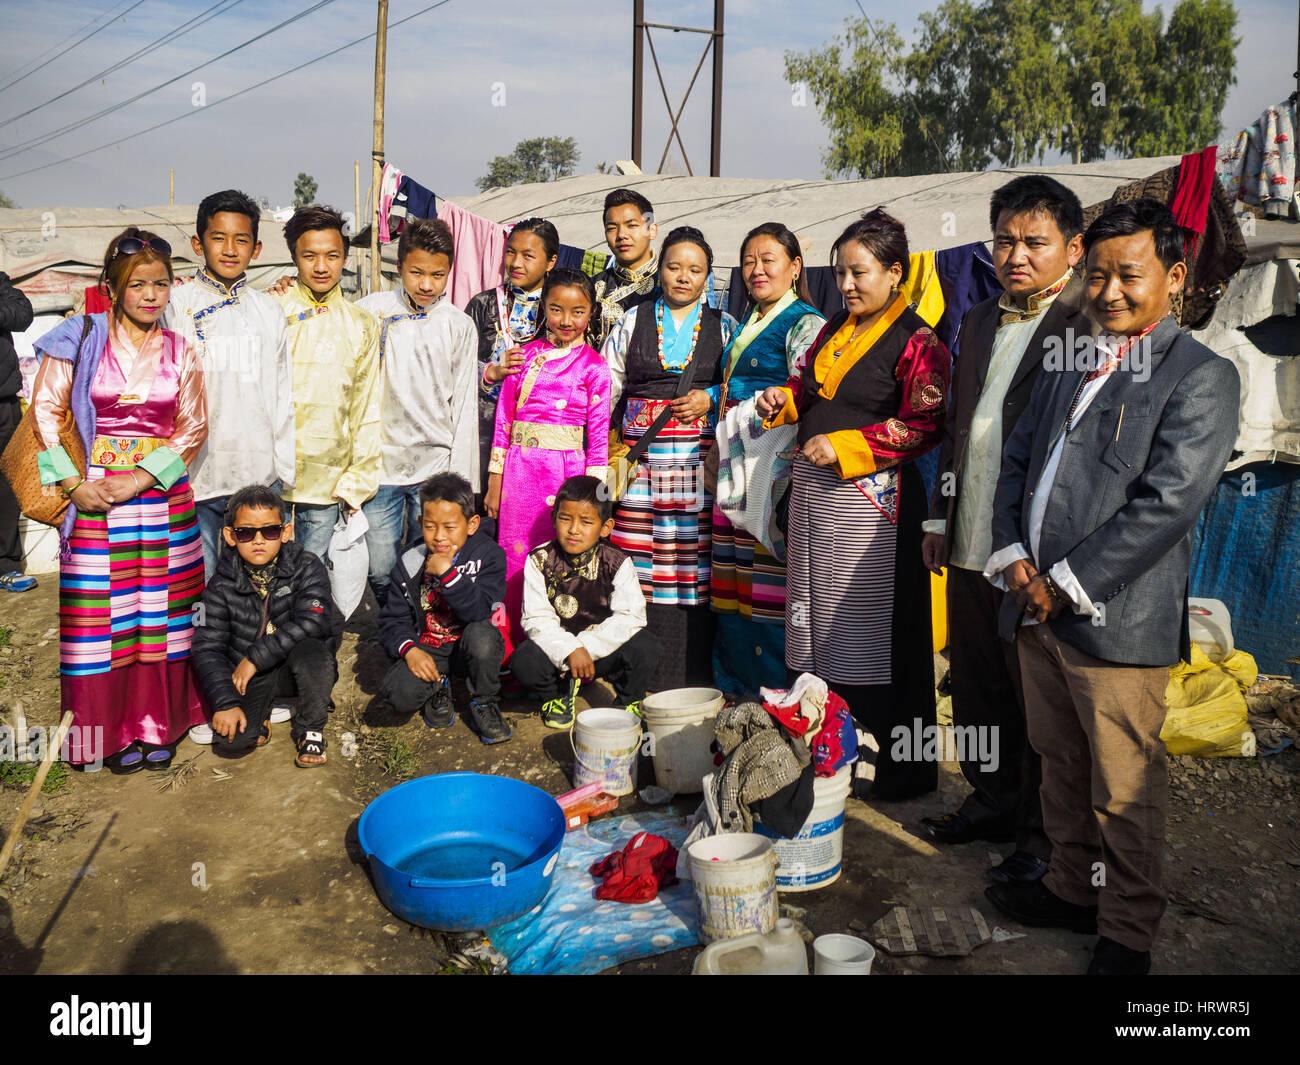 Kathmandu, Central Development Region, Nepal. 4th Mar, 2017. A portrait of an extended Nepali Sherpa family in an - Stock Image